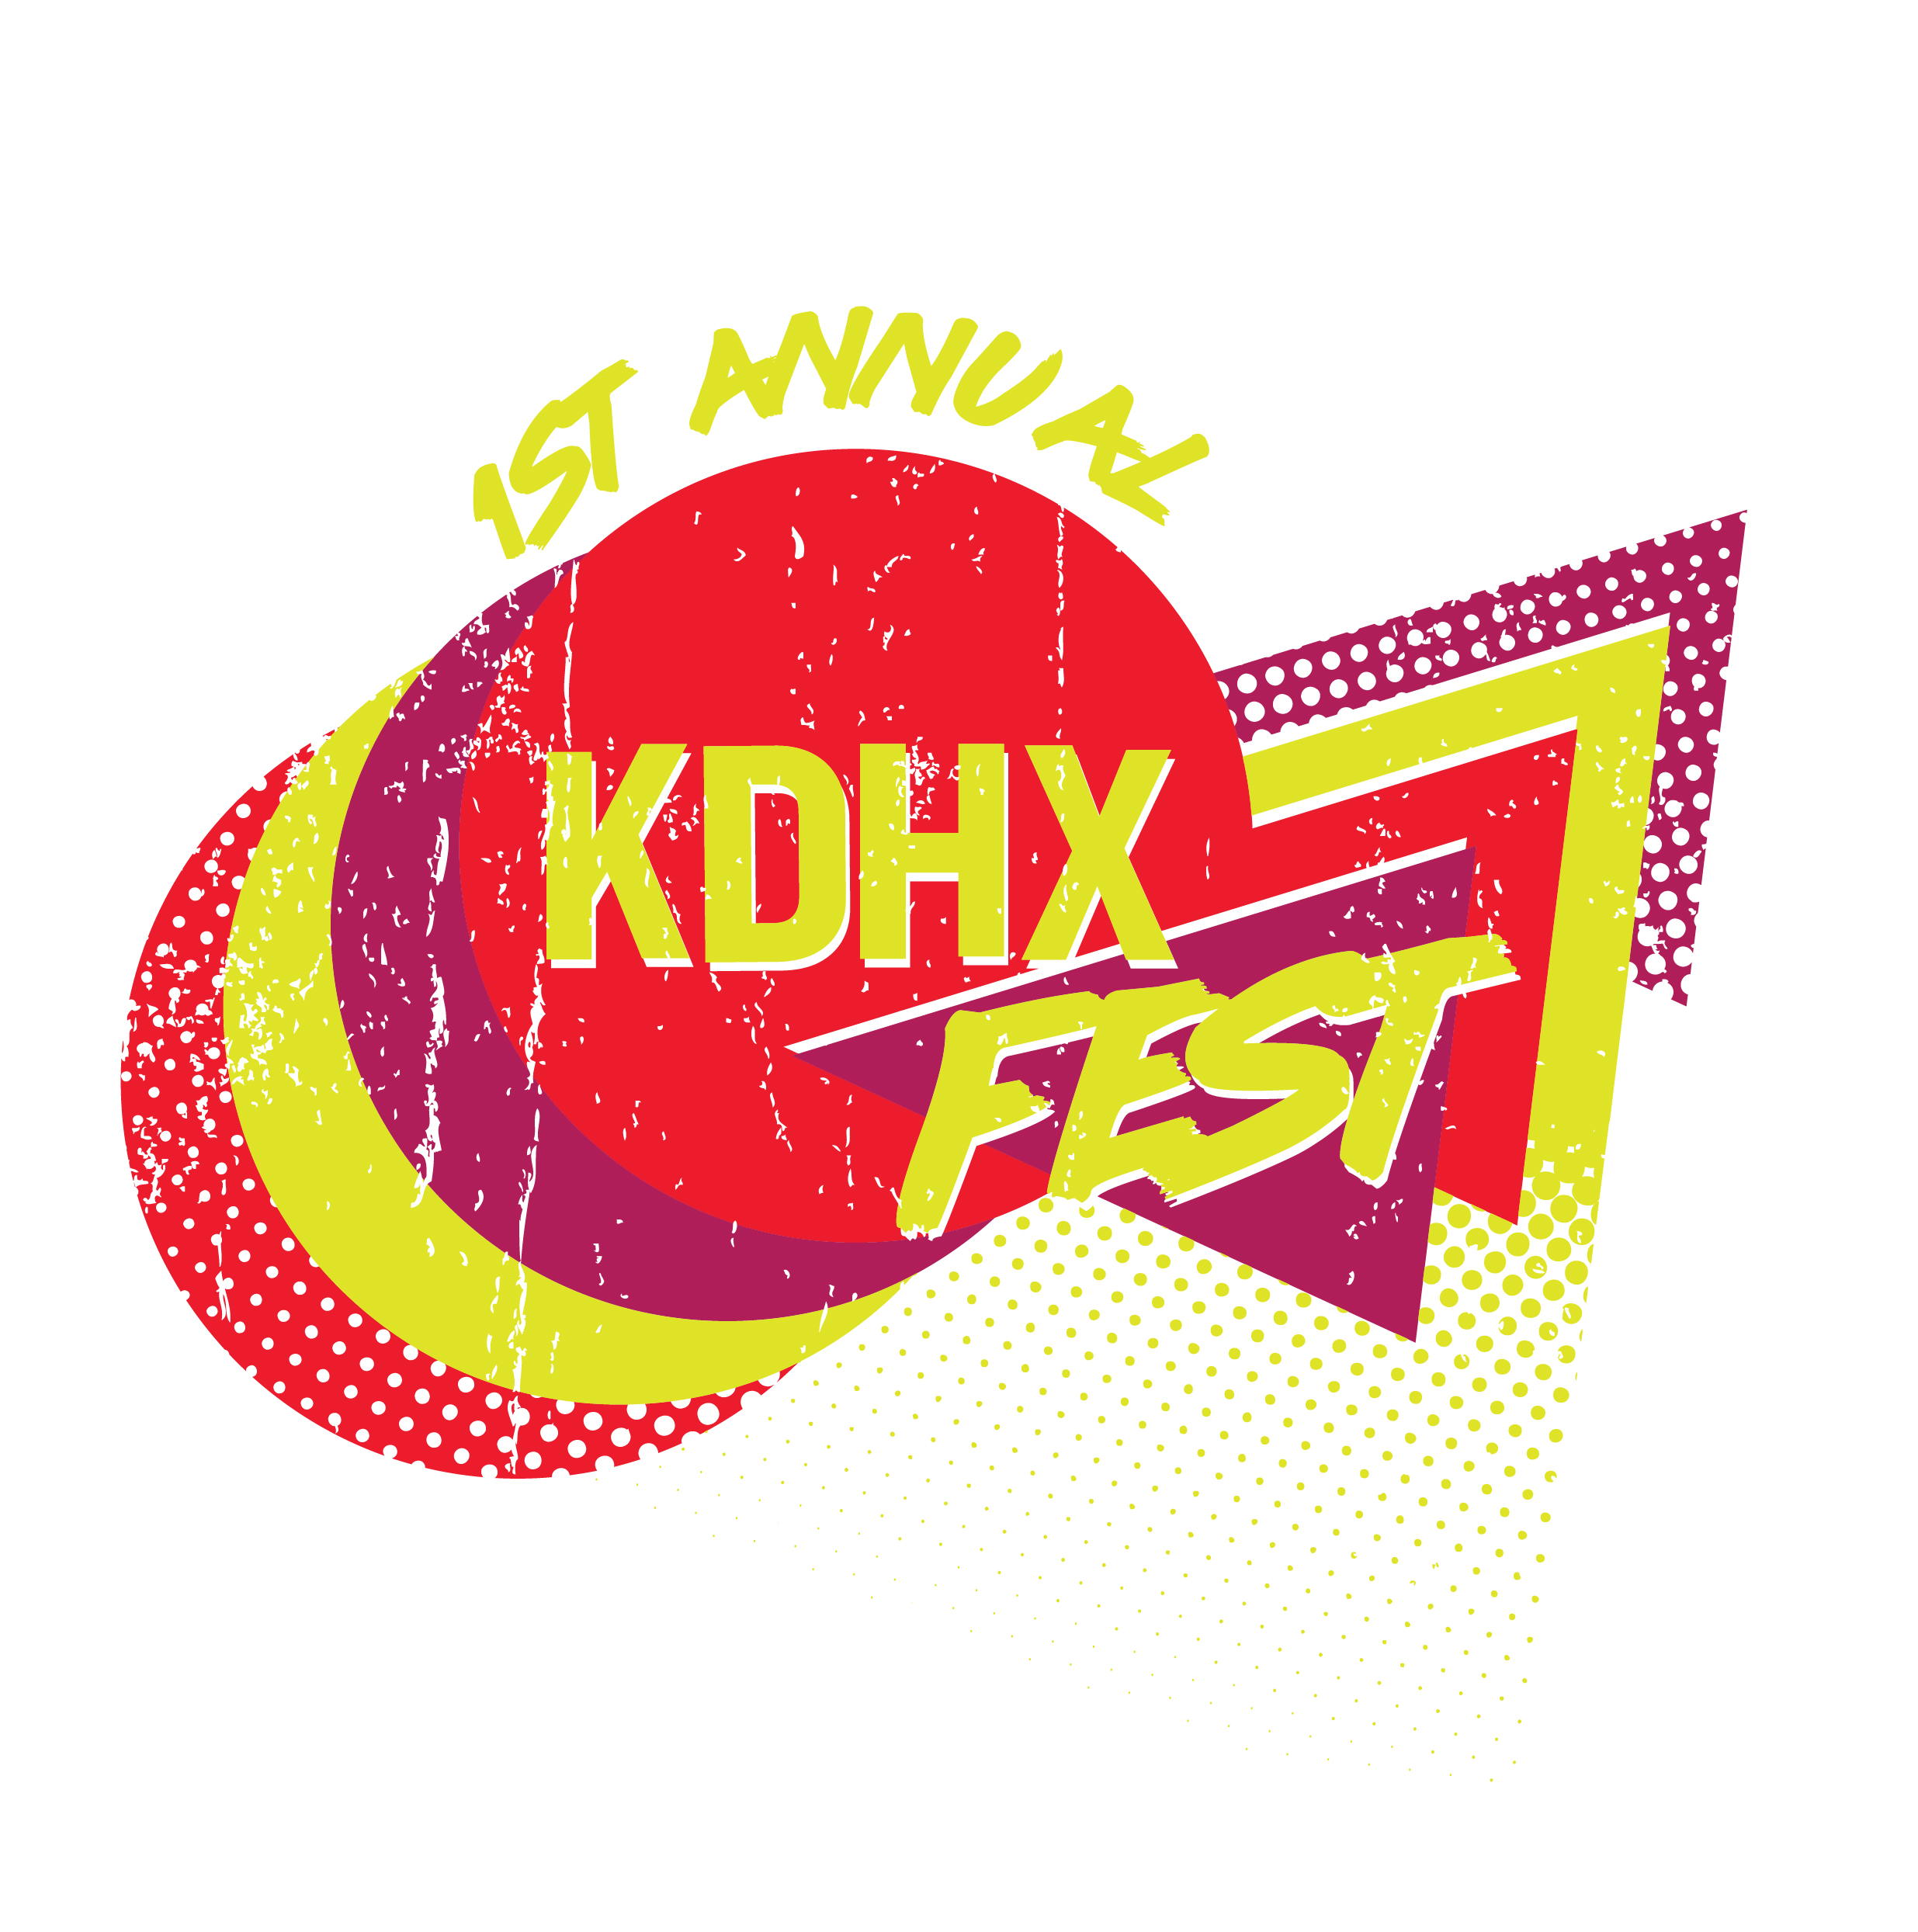 kdhx fest final-01.jpg